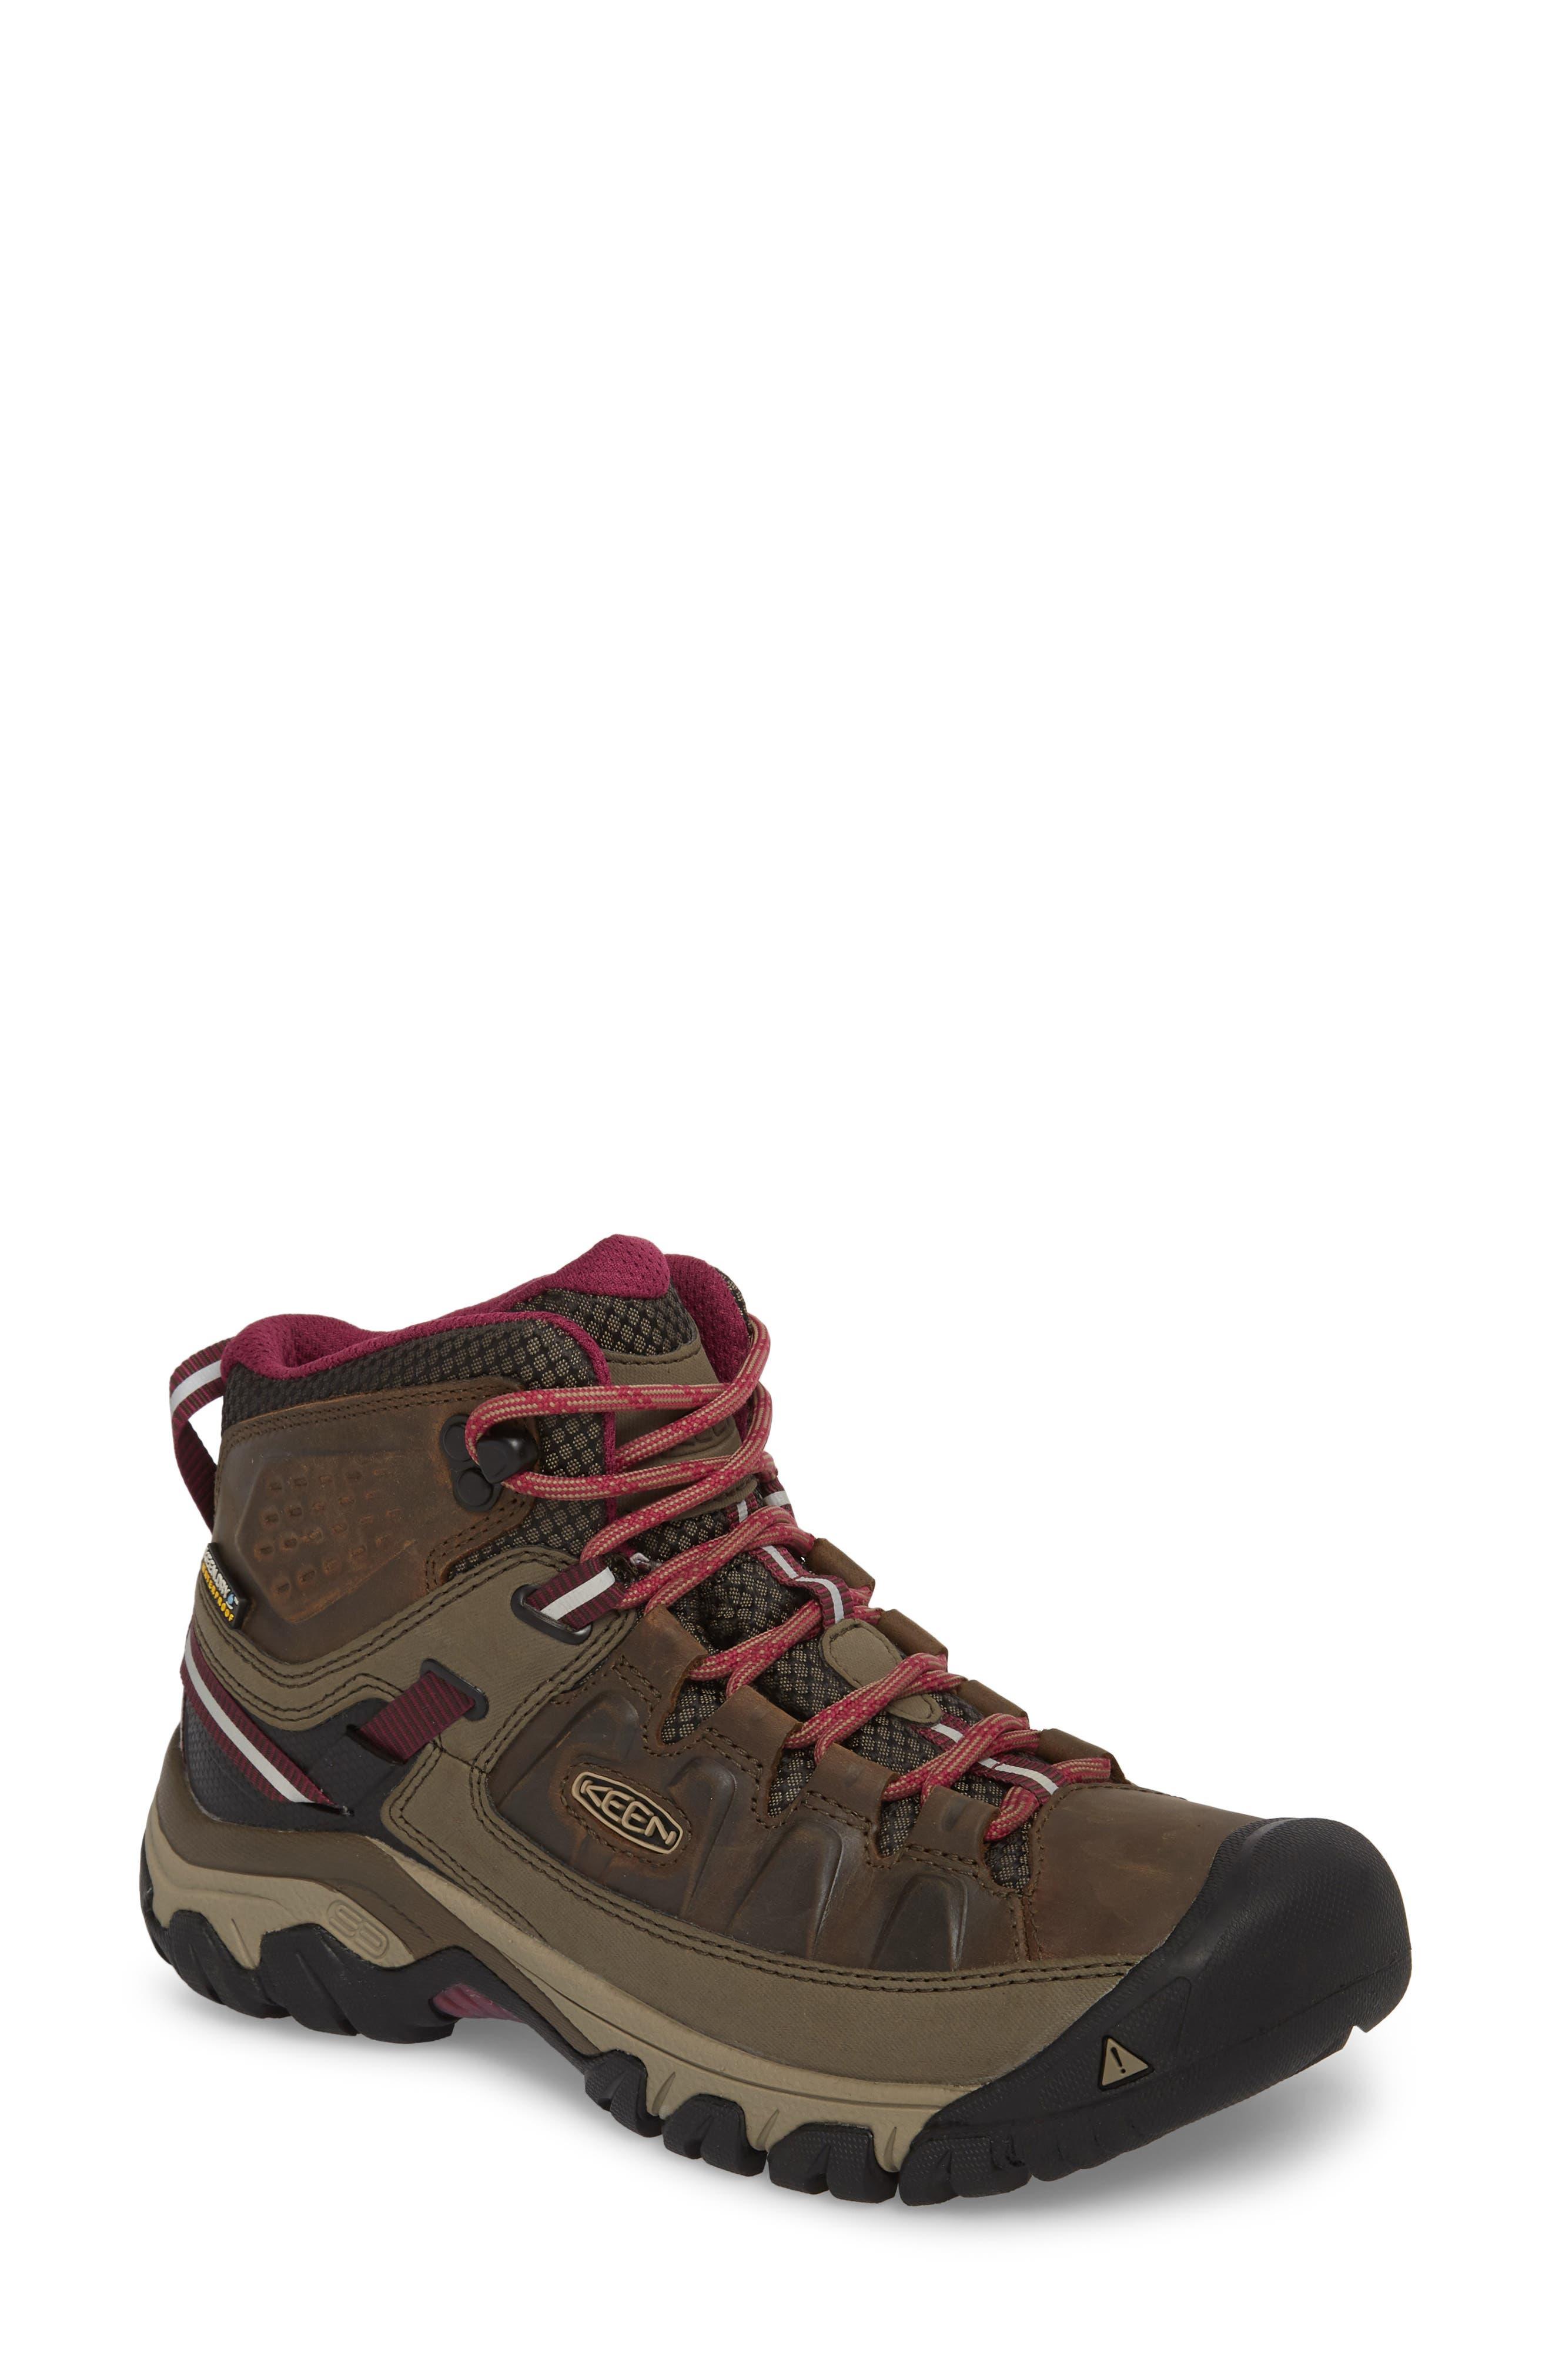 Targhee III Mid Waterproof Hiking Boot,                         Main,                         color, Weiss/ Boysenberry Leather